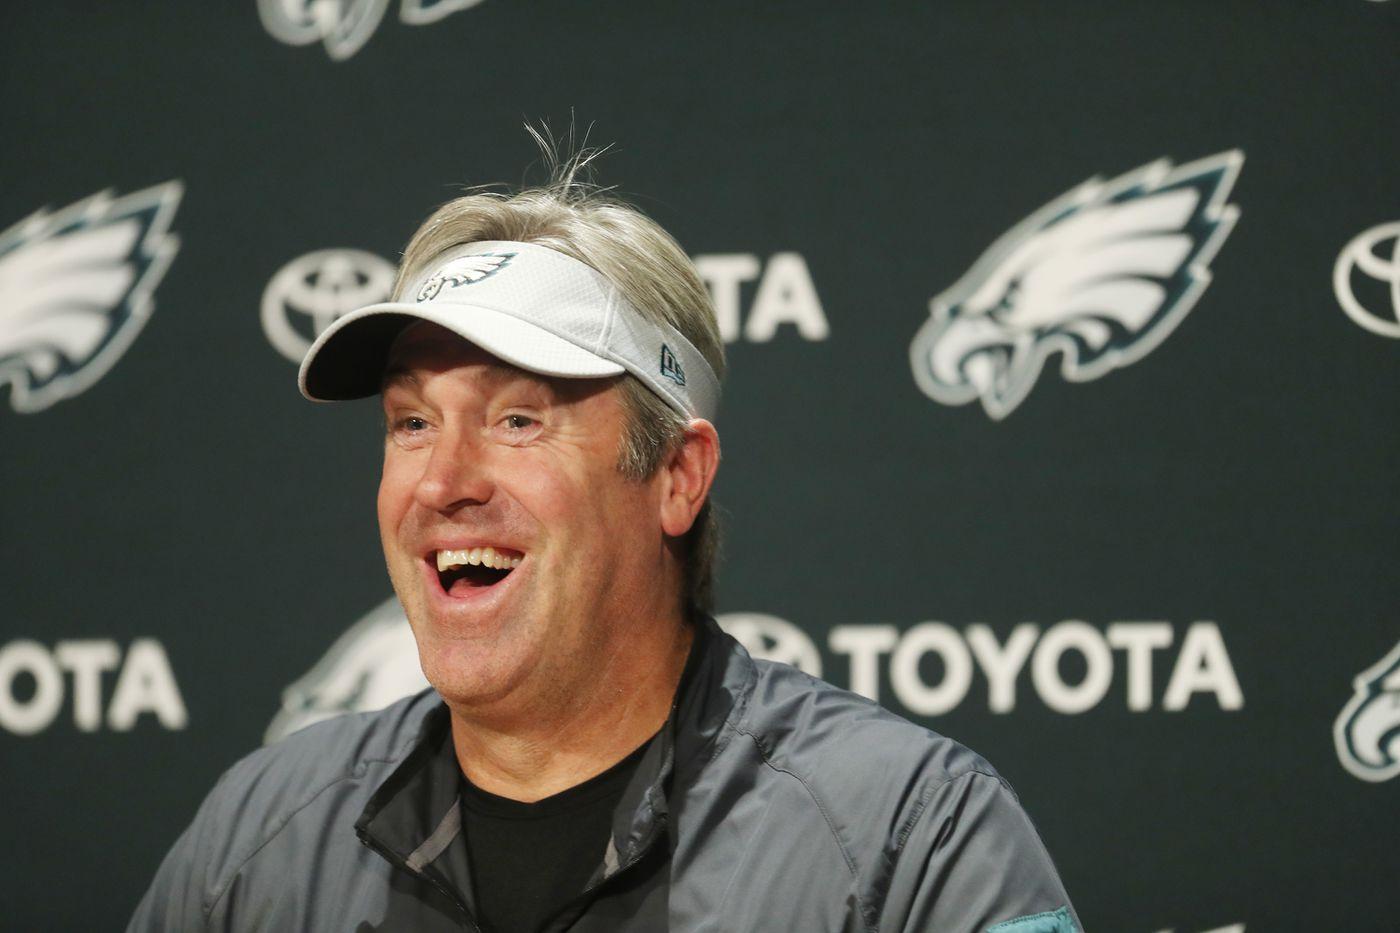 Eagles coach Doug Pederson's press conference at 10:15 | Live video